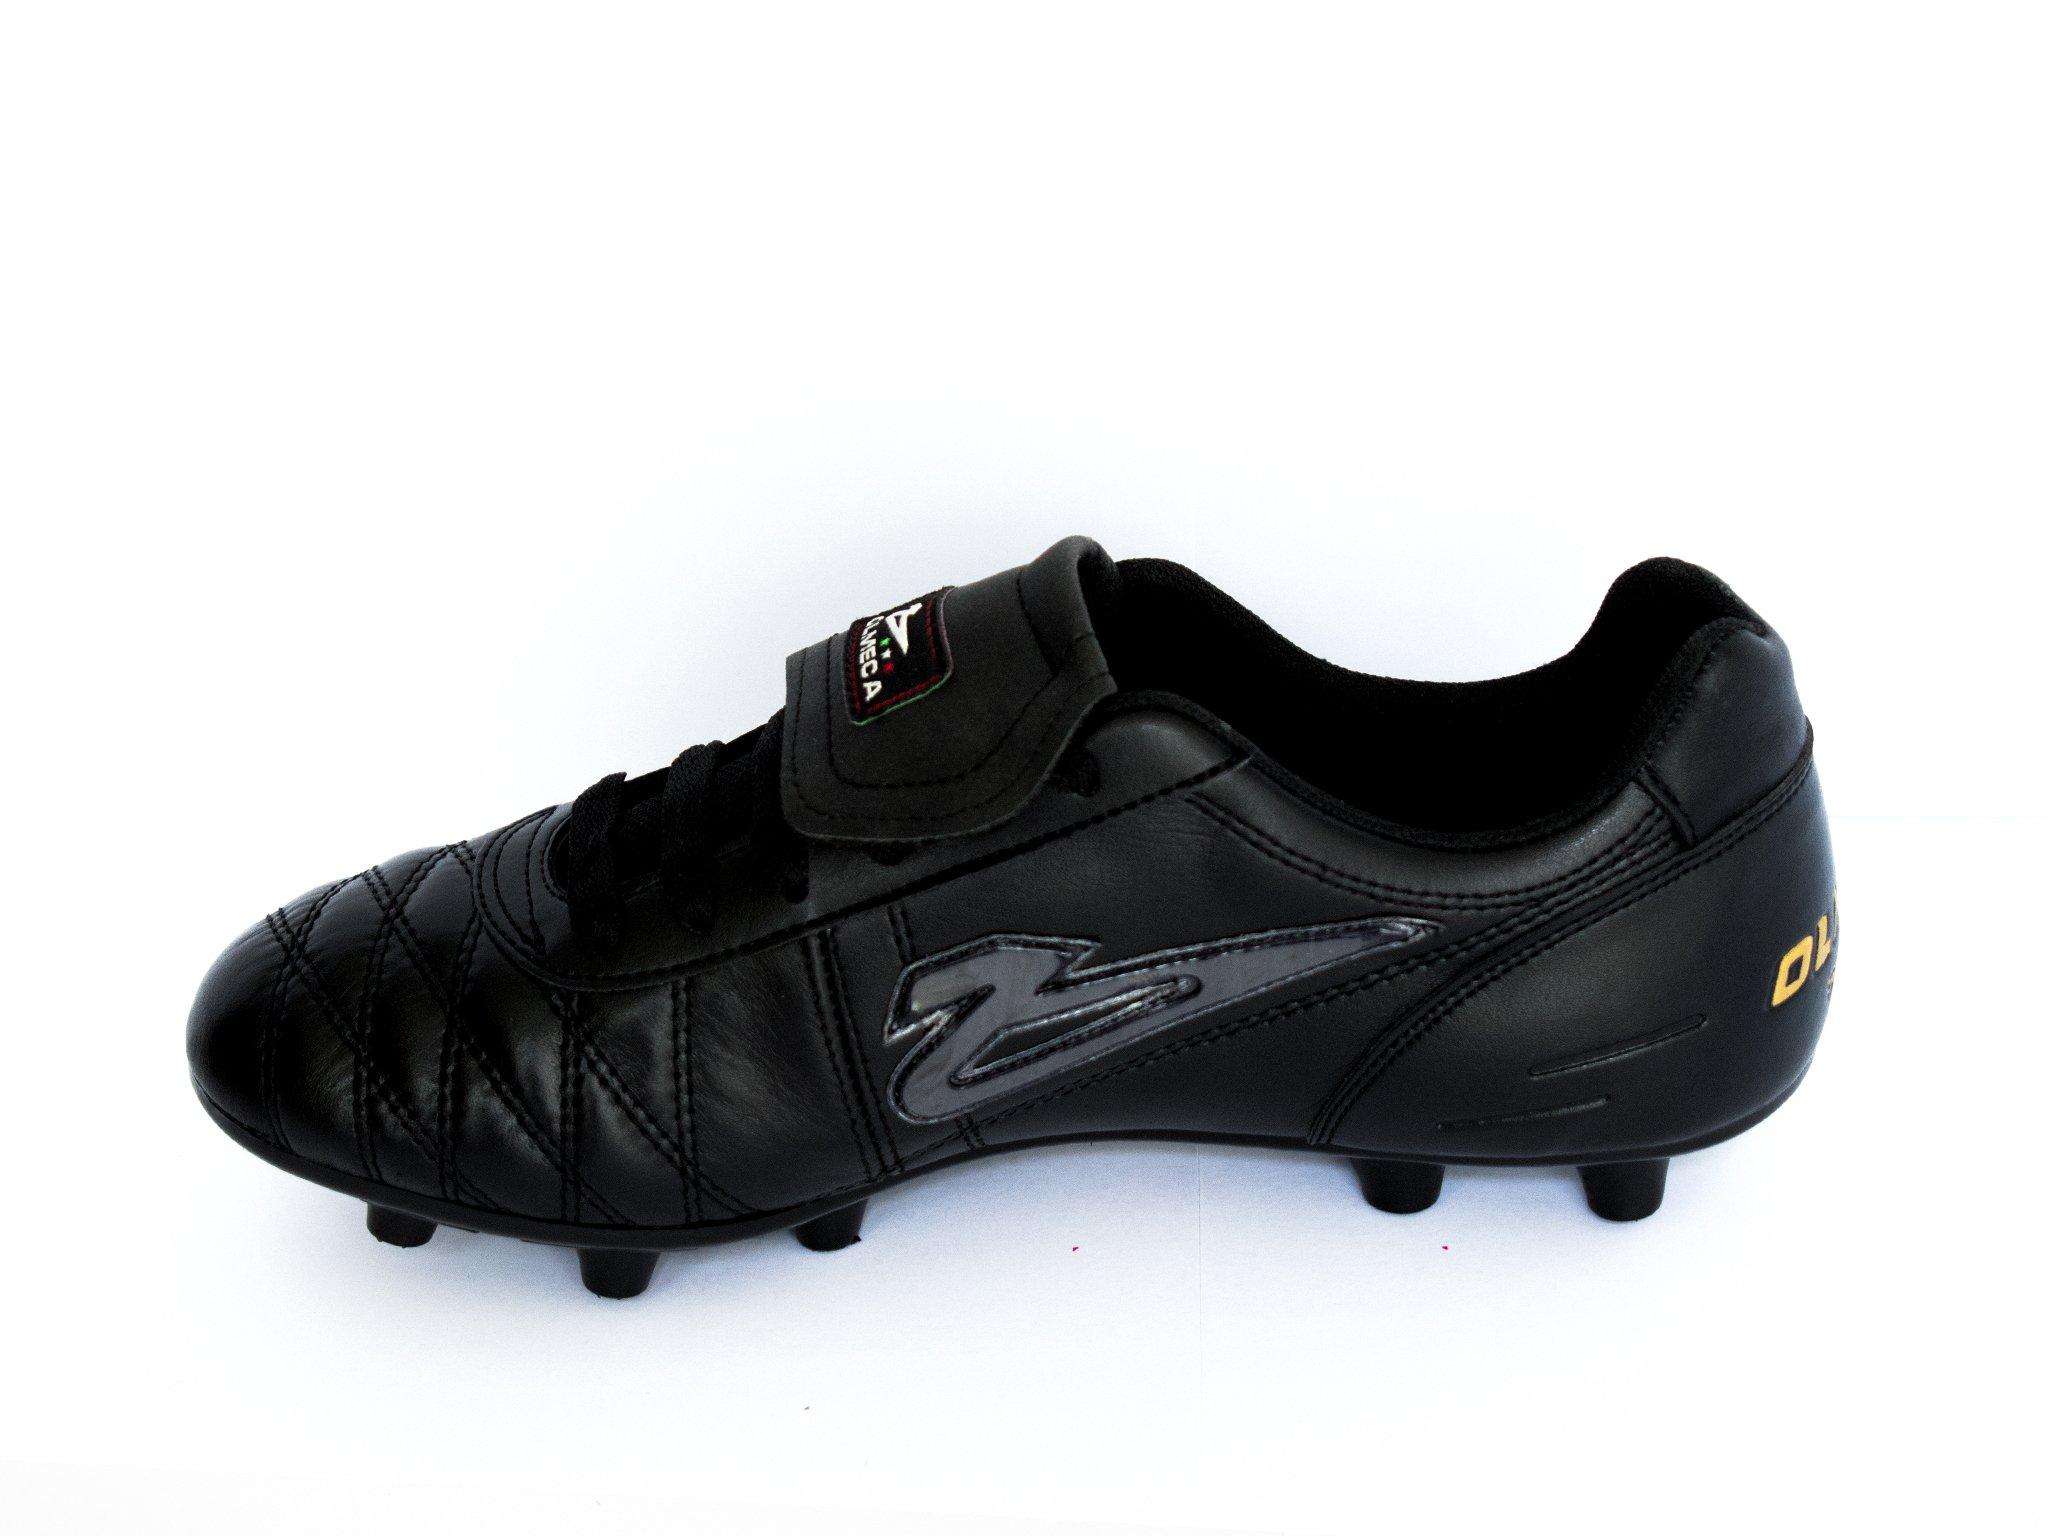 Zapato de fútbol Olmeca mod. UpperPro az negro